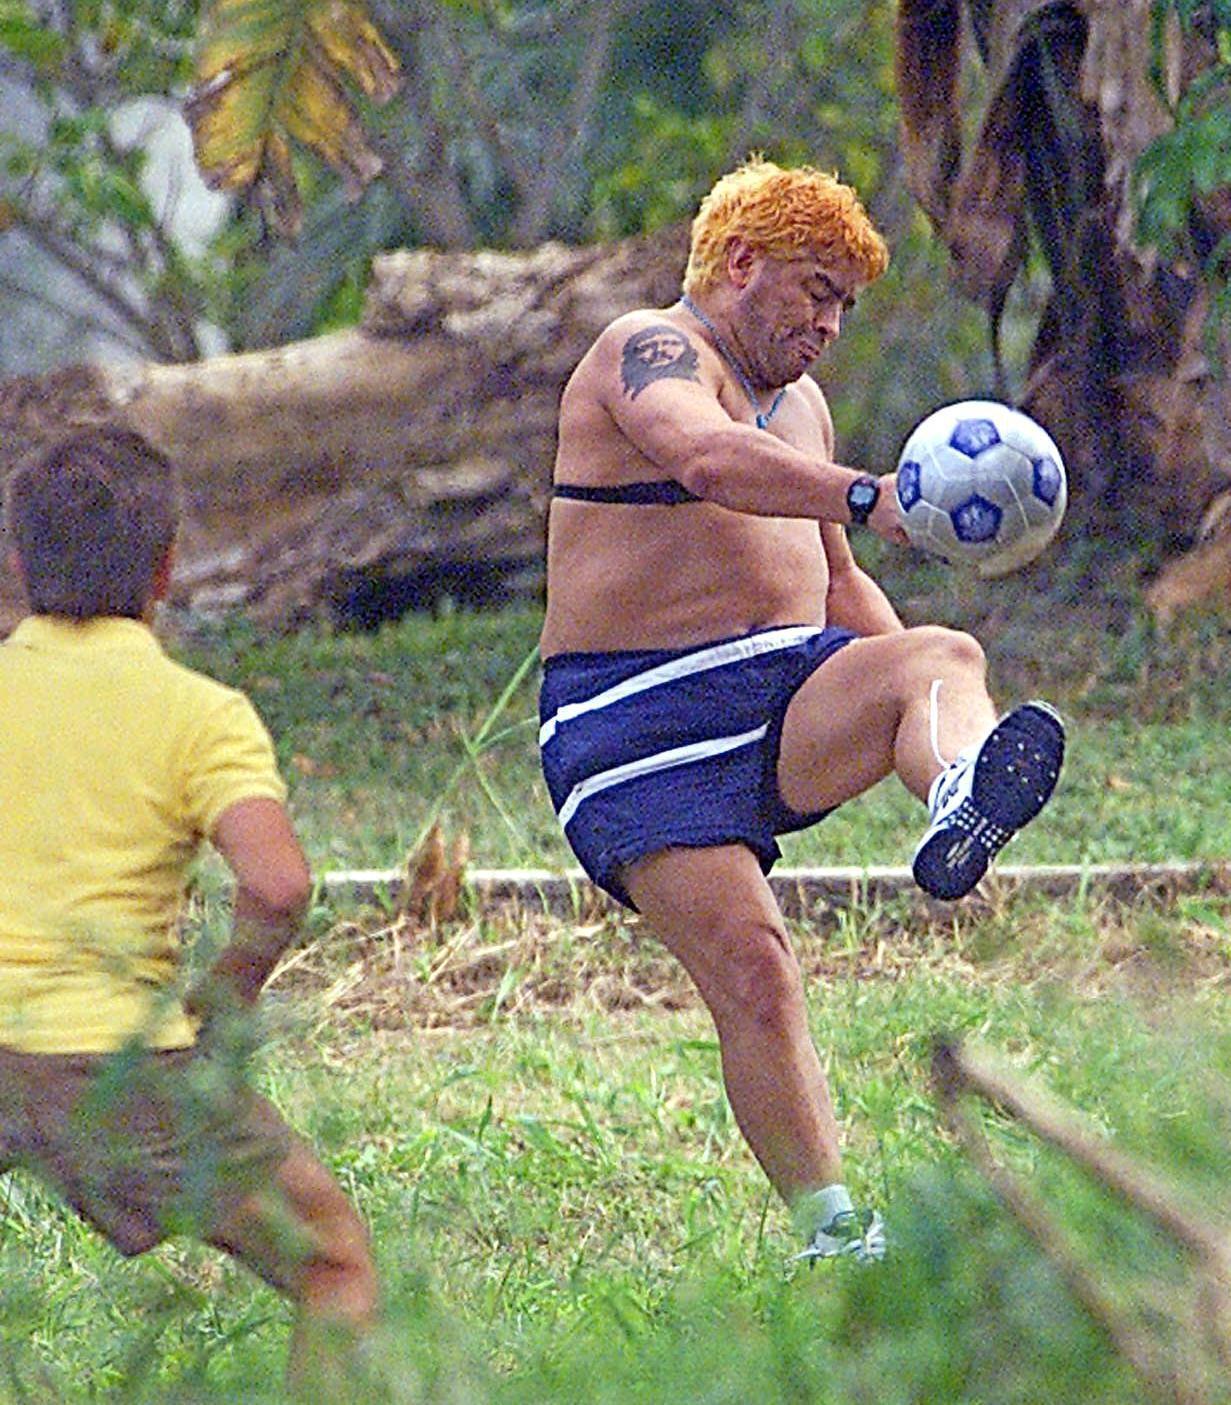 Bild zu Diego Maradona, Rehabilitation, Garten, Fussball, Kuba, Las Praderas